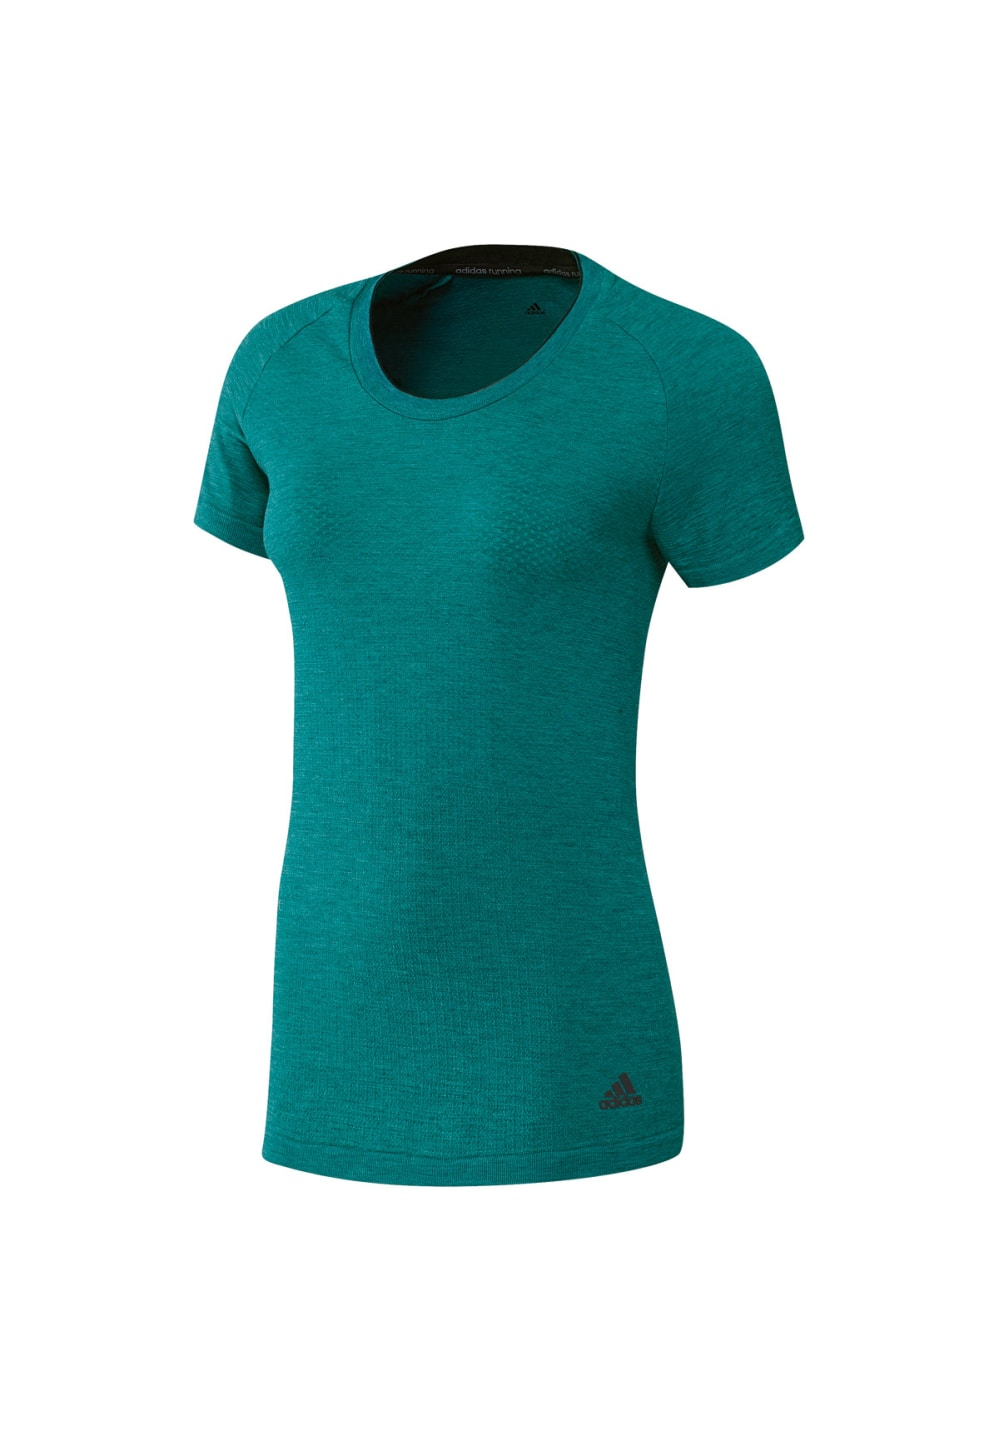 Adidas adiStar Wool Primeknit Short Sleeve Femmes Maillot course